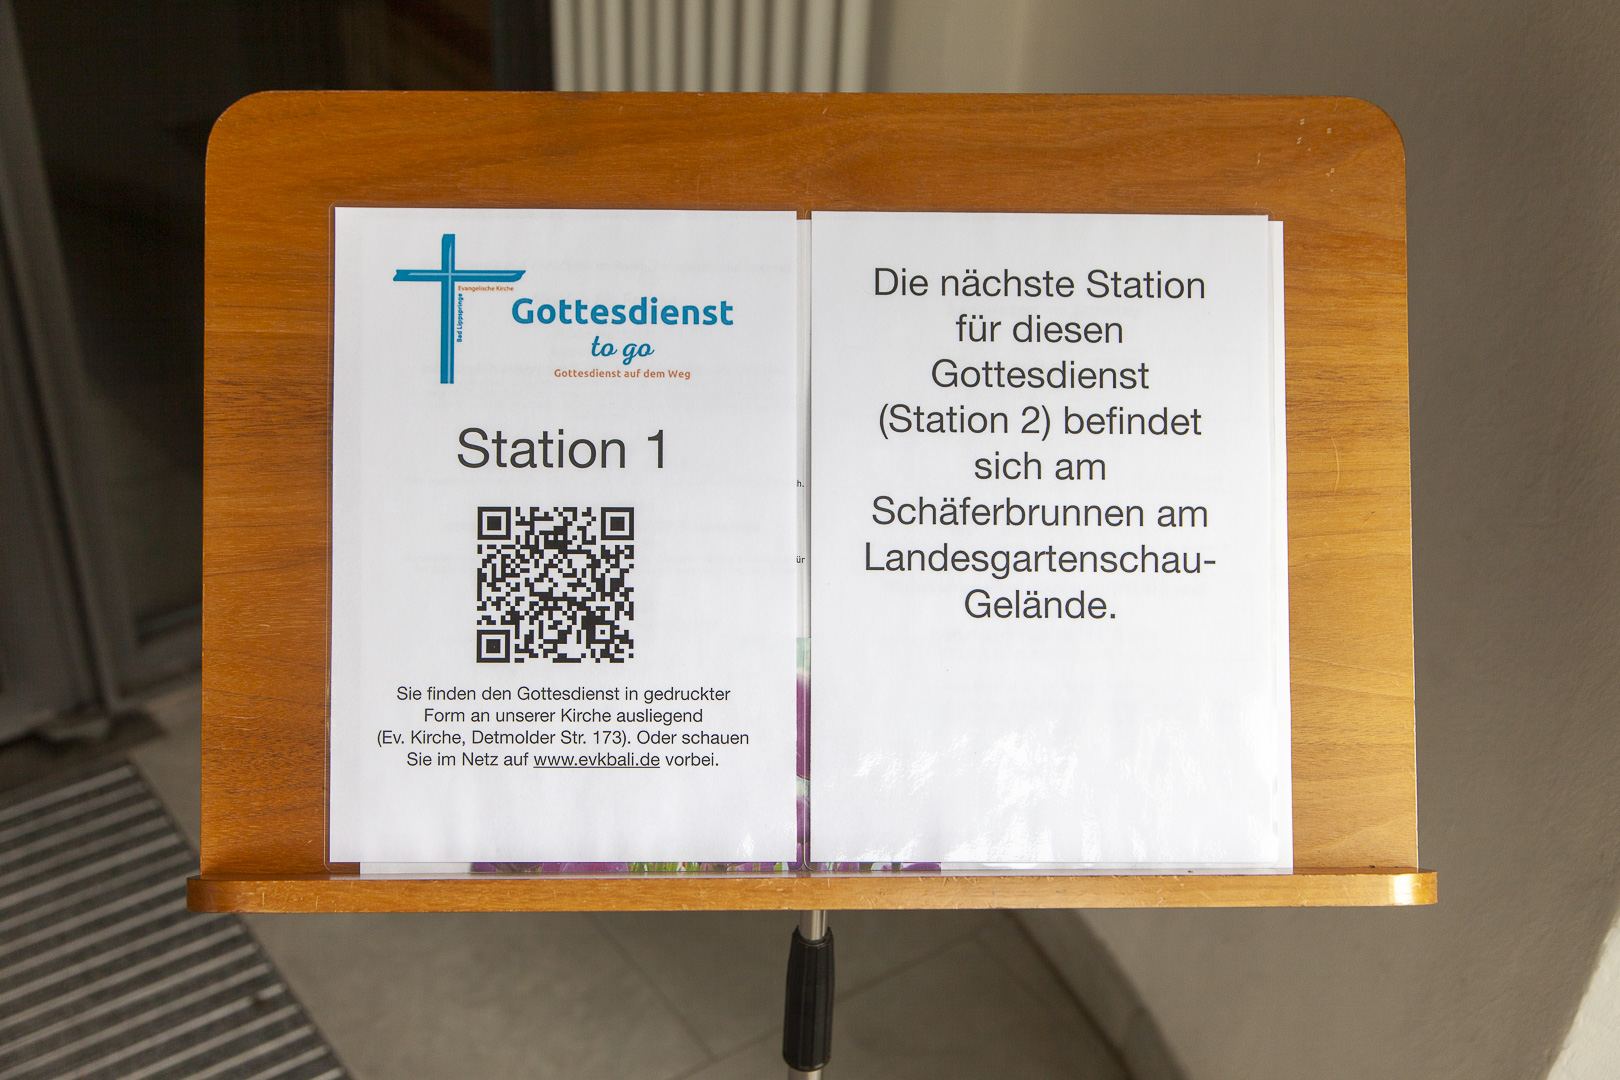 Station 1 - Begrüßung in der Kirche